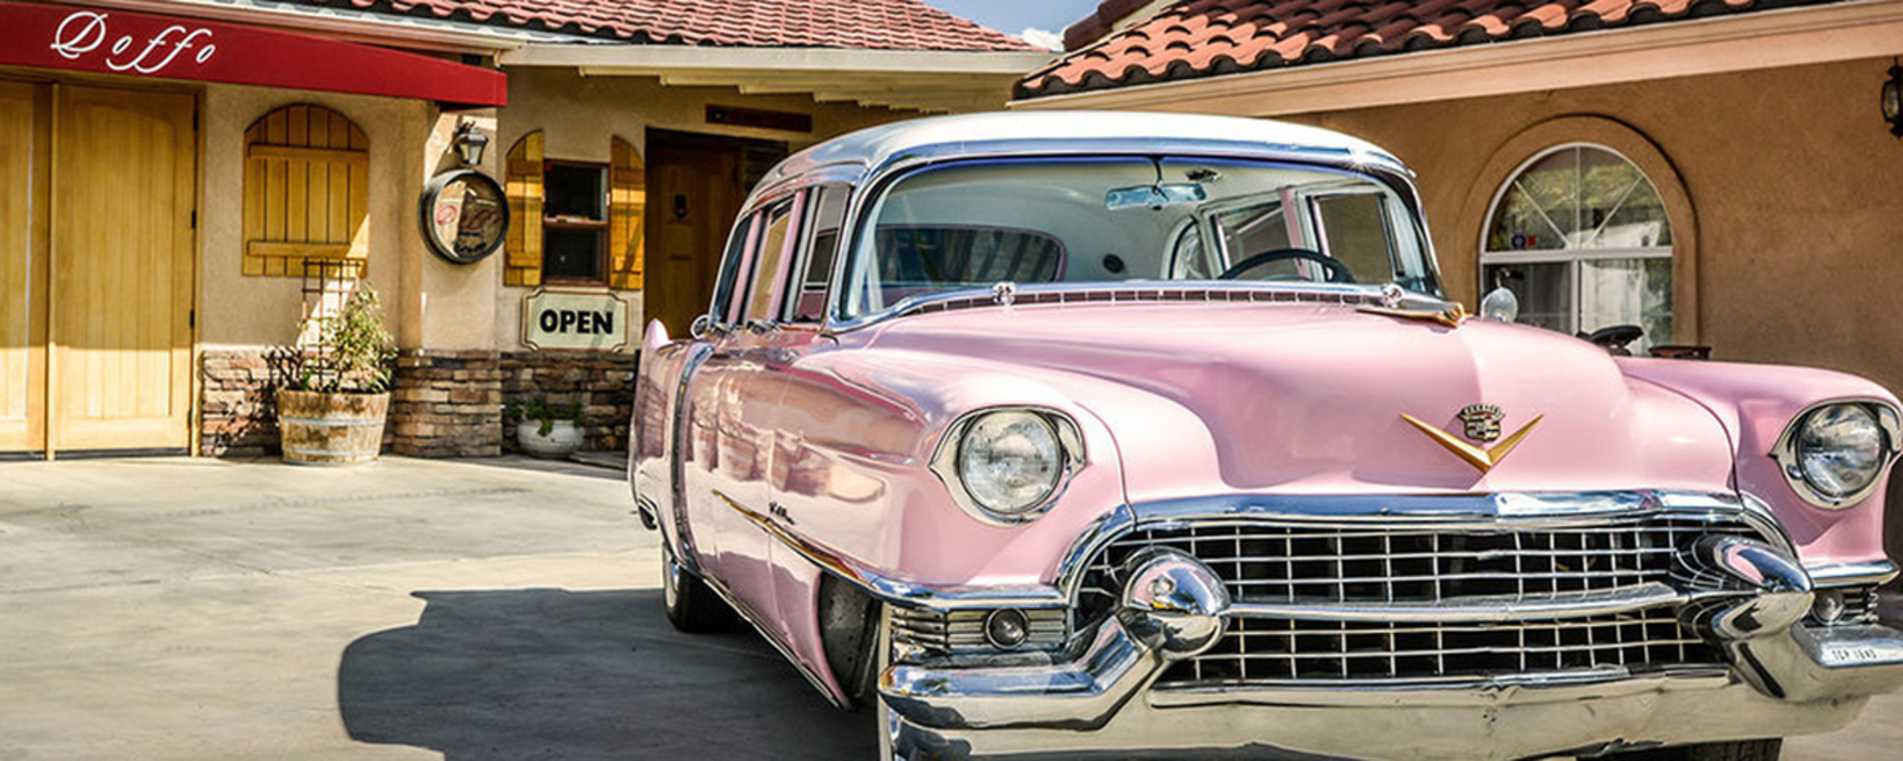 Antique Pink Cadillac - Temecula